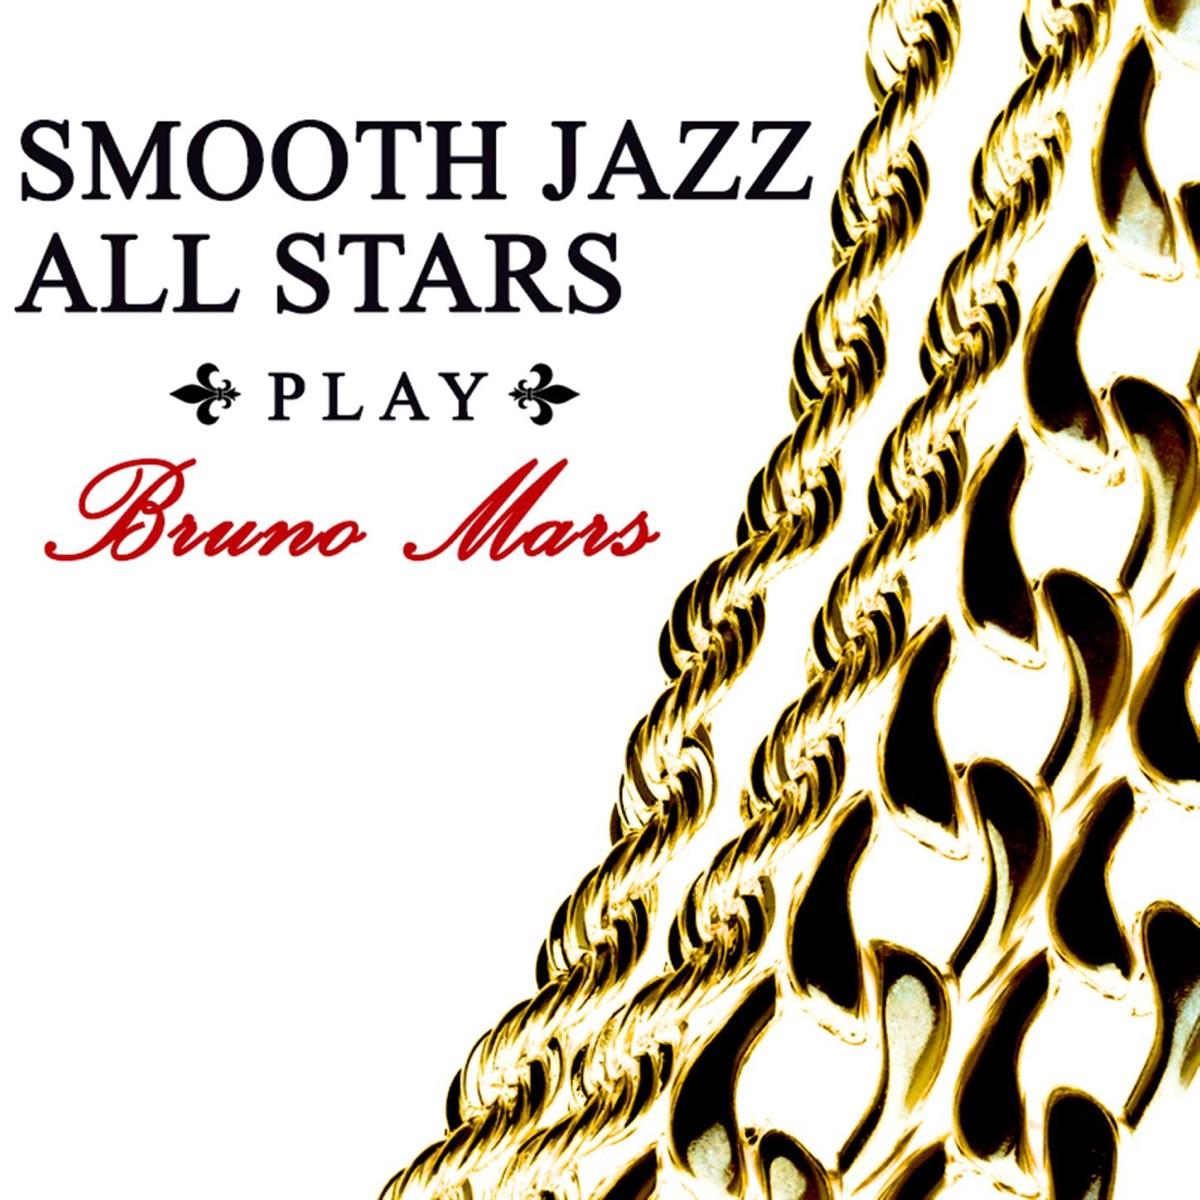 Smooth Jazz All Stars Play Bruno Mars Smooth Jazz All Stars CD cover